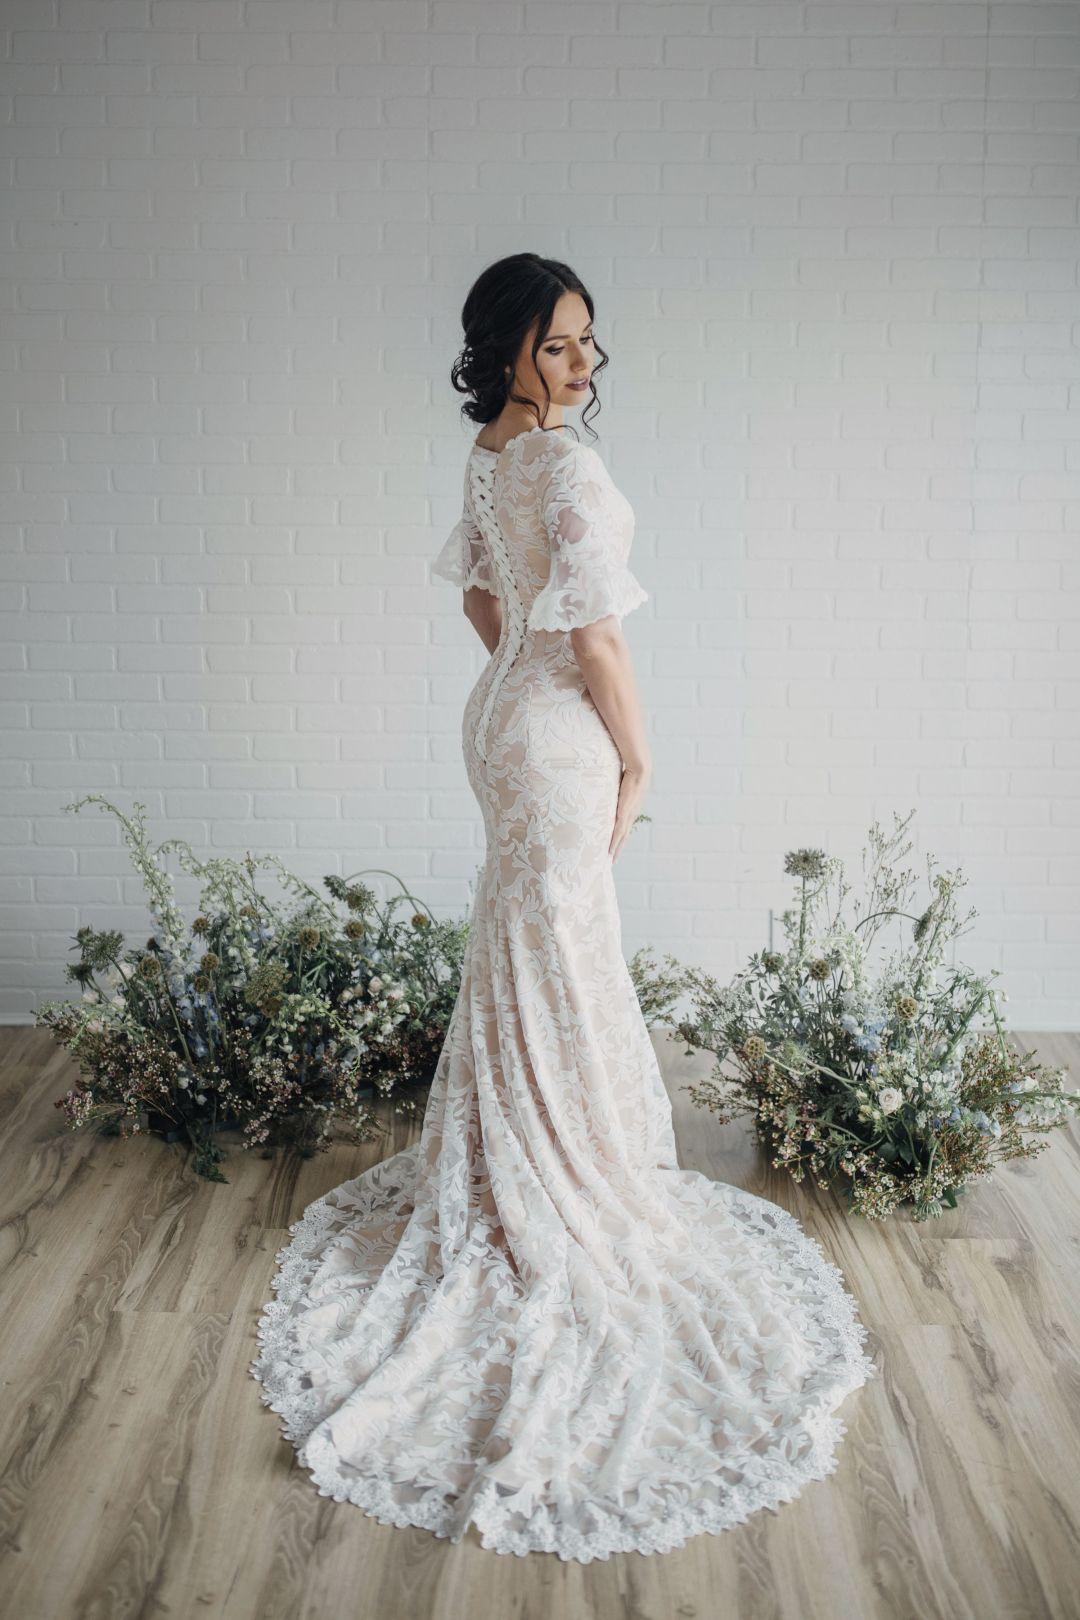 25 Modest Mermaid Wedding Dresses Lds Wedding Mermaid Wedding Dress With Sleeves Modest Wedding Dress Mermaid Modest Wedding Dresses Lds [ 1620 x 1080 Pixel ]